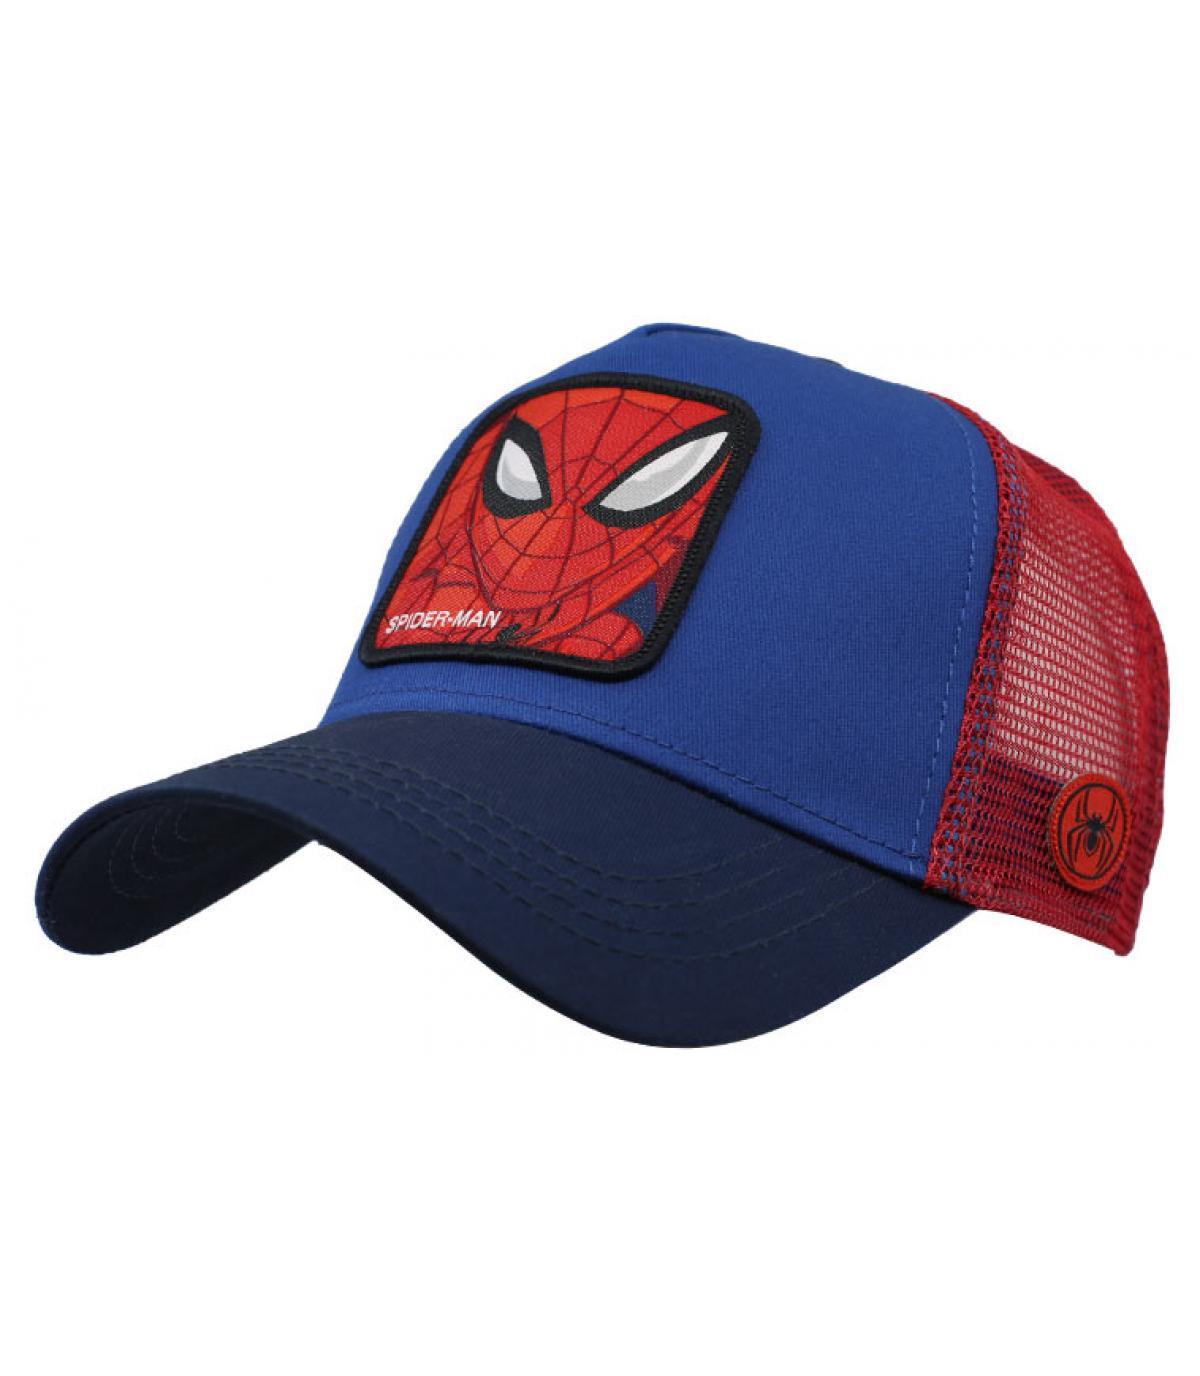 Dettagli Trucker Spiderman - image 2